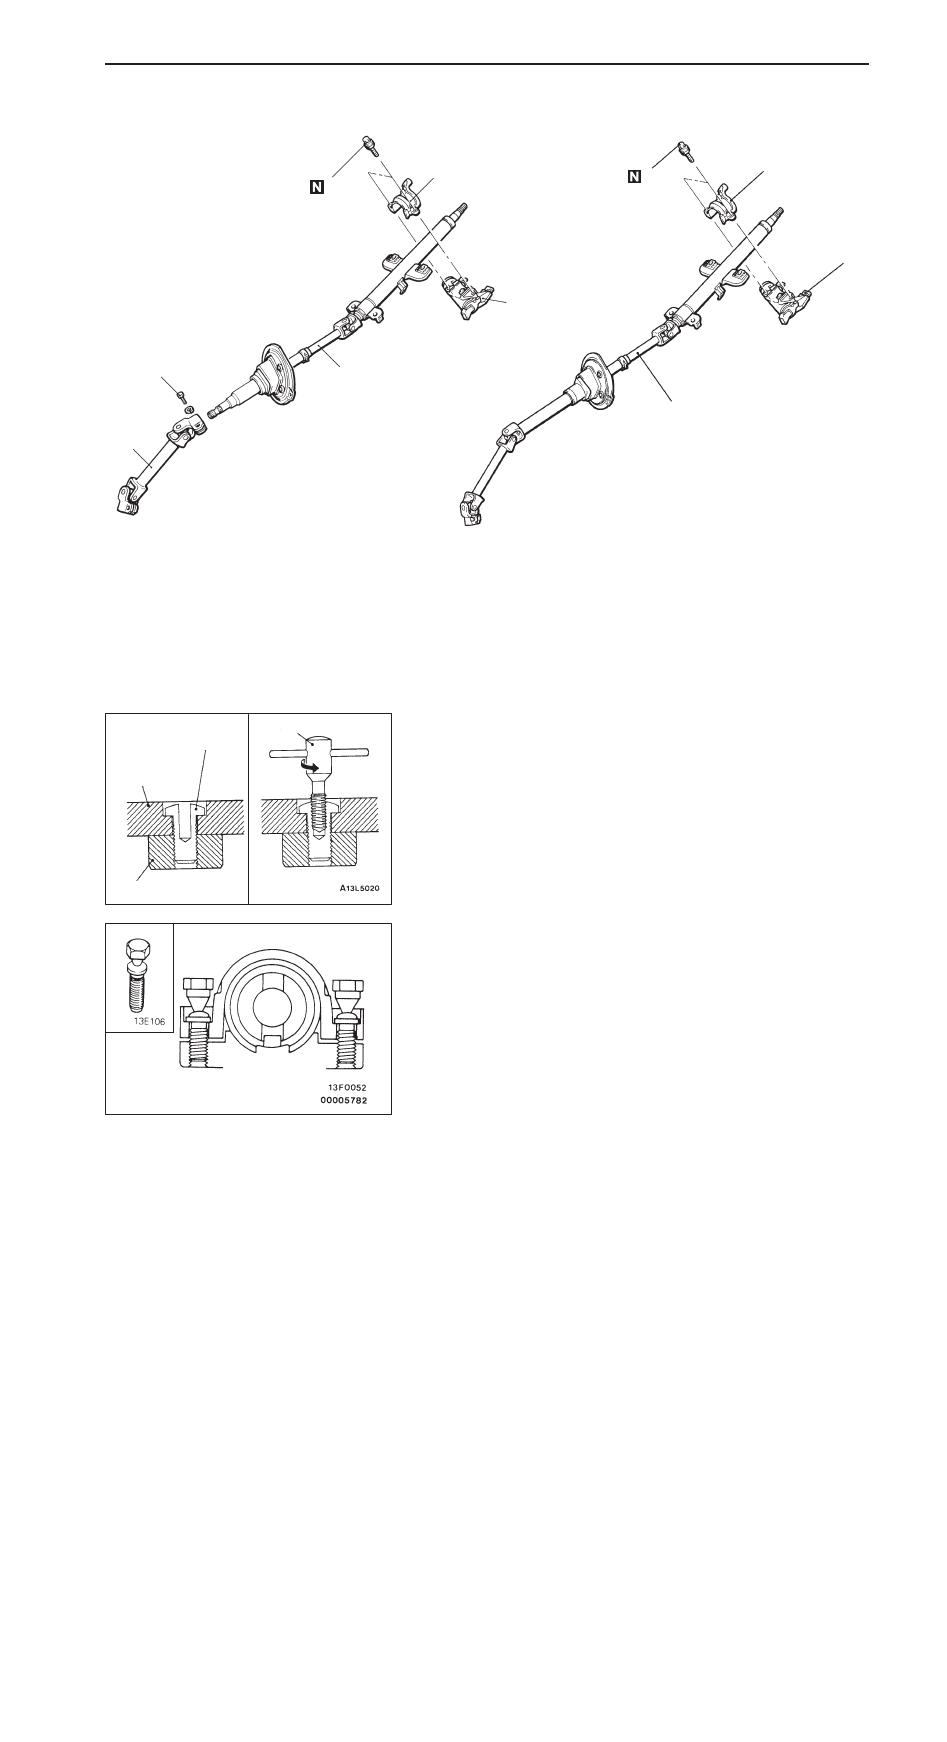 Mitsubishi Pajero Pinin Manual Part 263 Steering Diagram